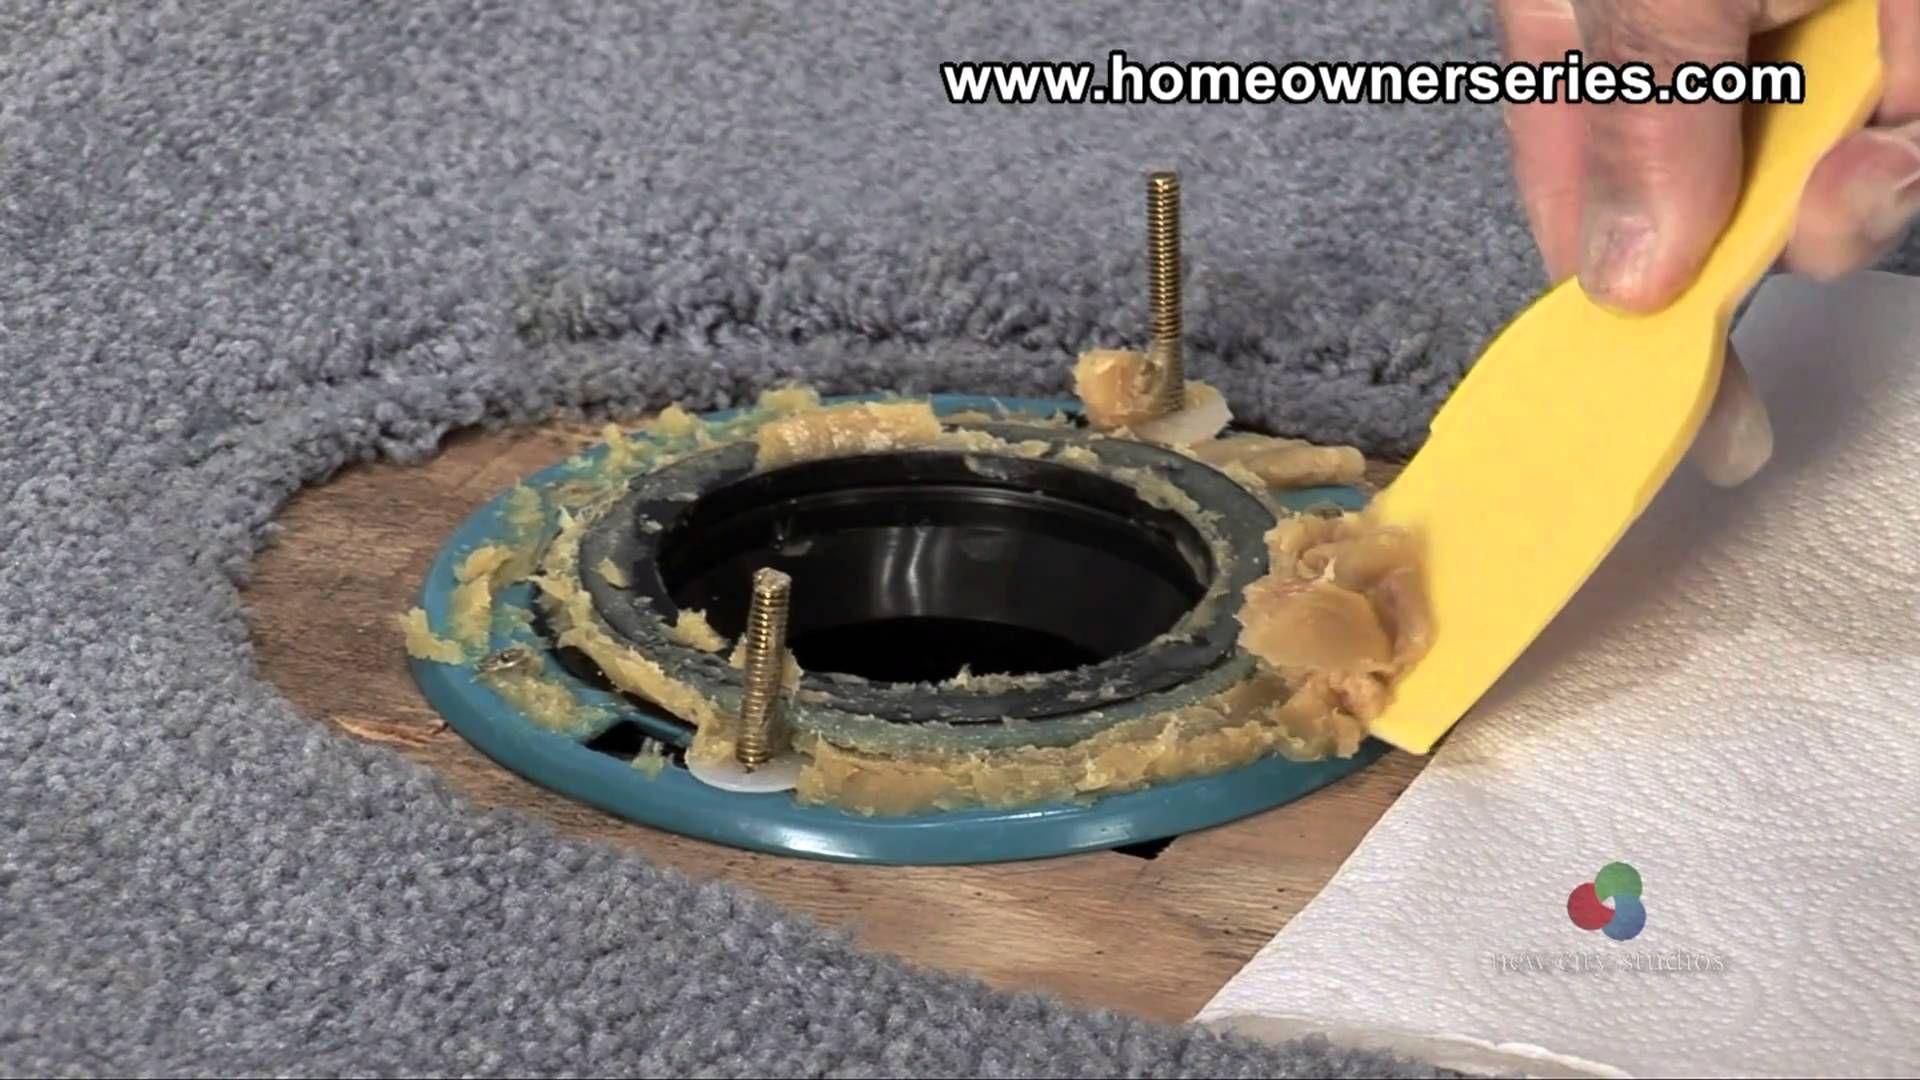 How to fix a toilet diagnostics leaking base